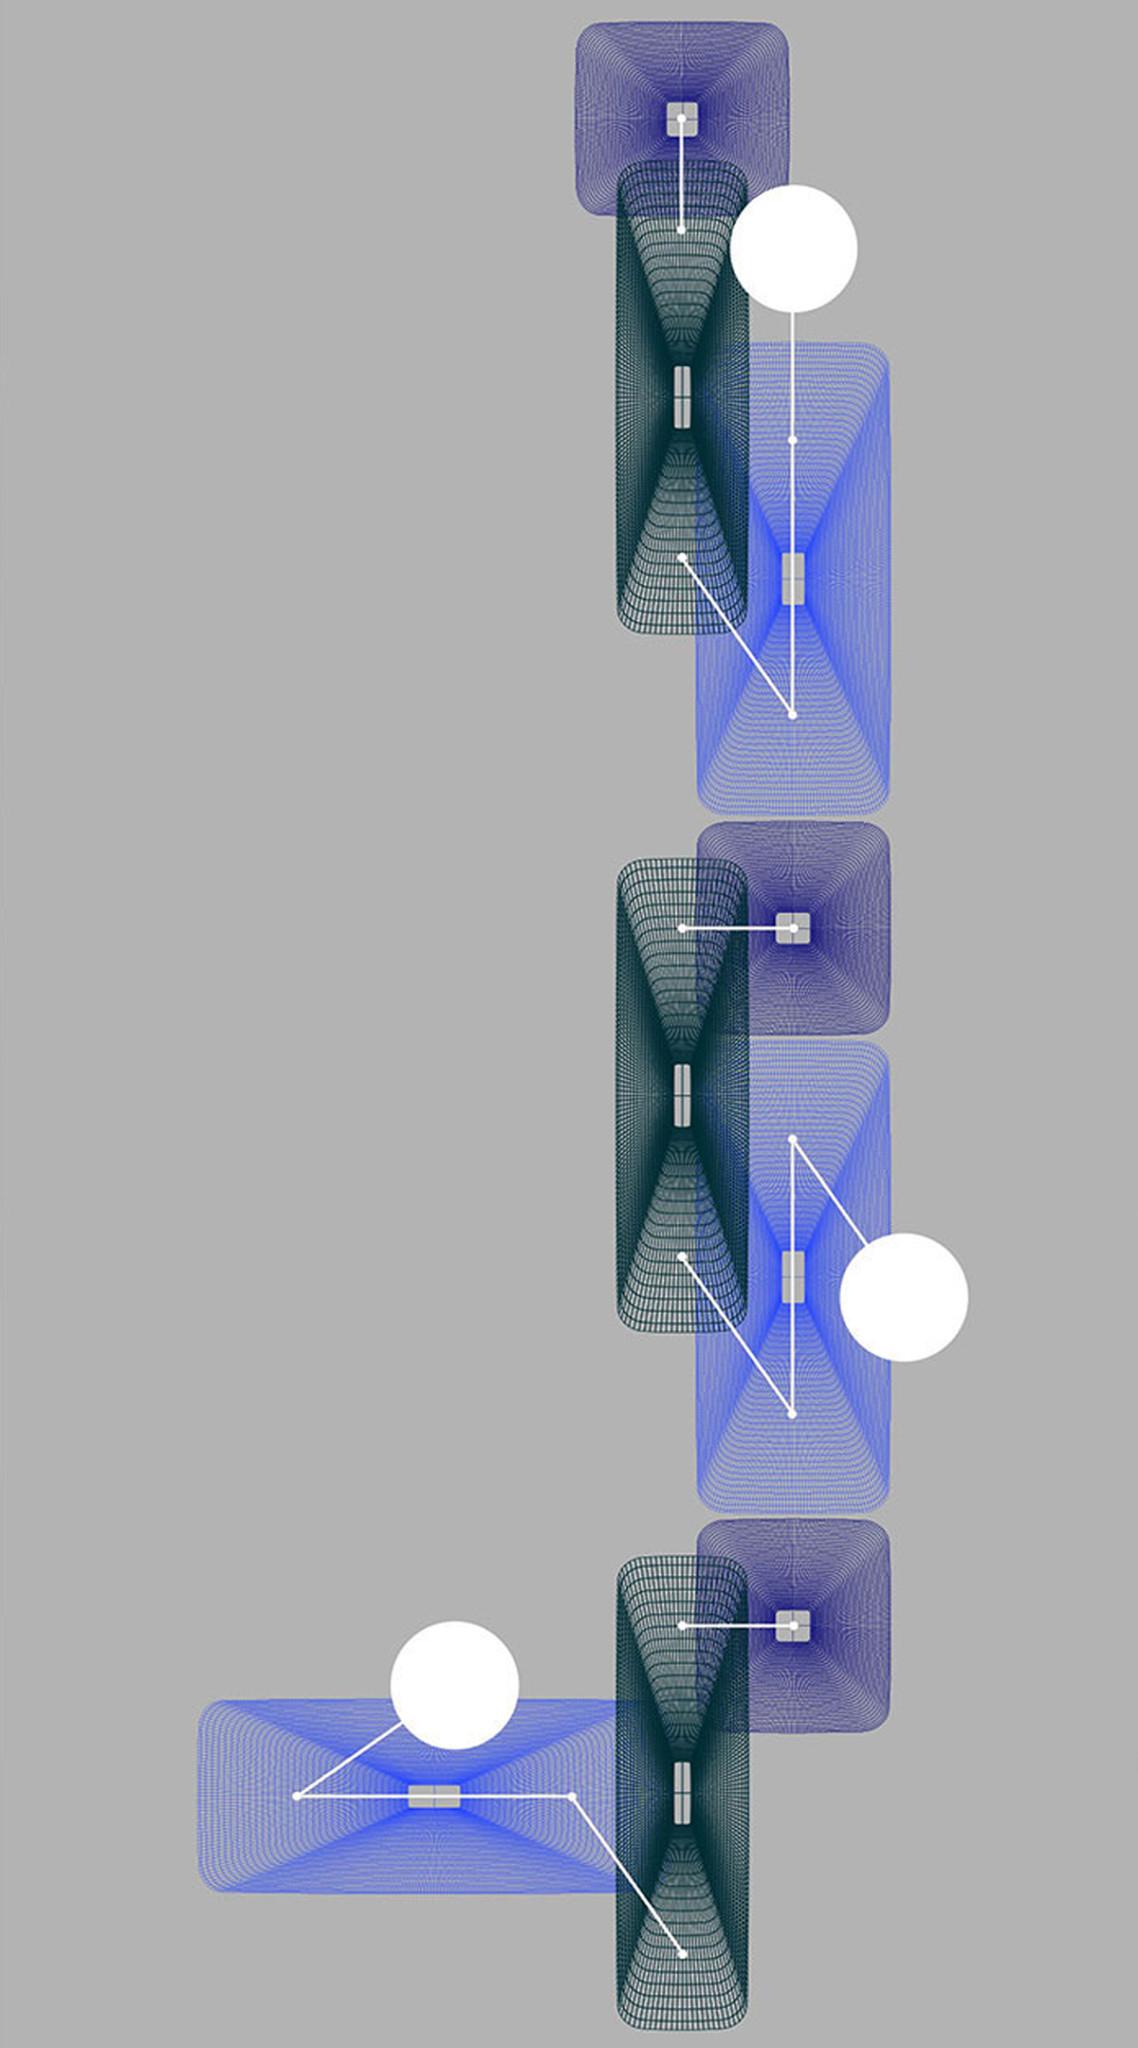 NaoTamura_HBF01, hbf, sofa, furniture, naotamura, nownao, design, designer, japanese, nature, kanso,Design, NaoTamura, New York, Japanese, 田村なお、田村奈穂、デザイナー、デザイン、プロダクト、ニューヨーク、女性デザイン